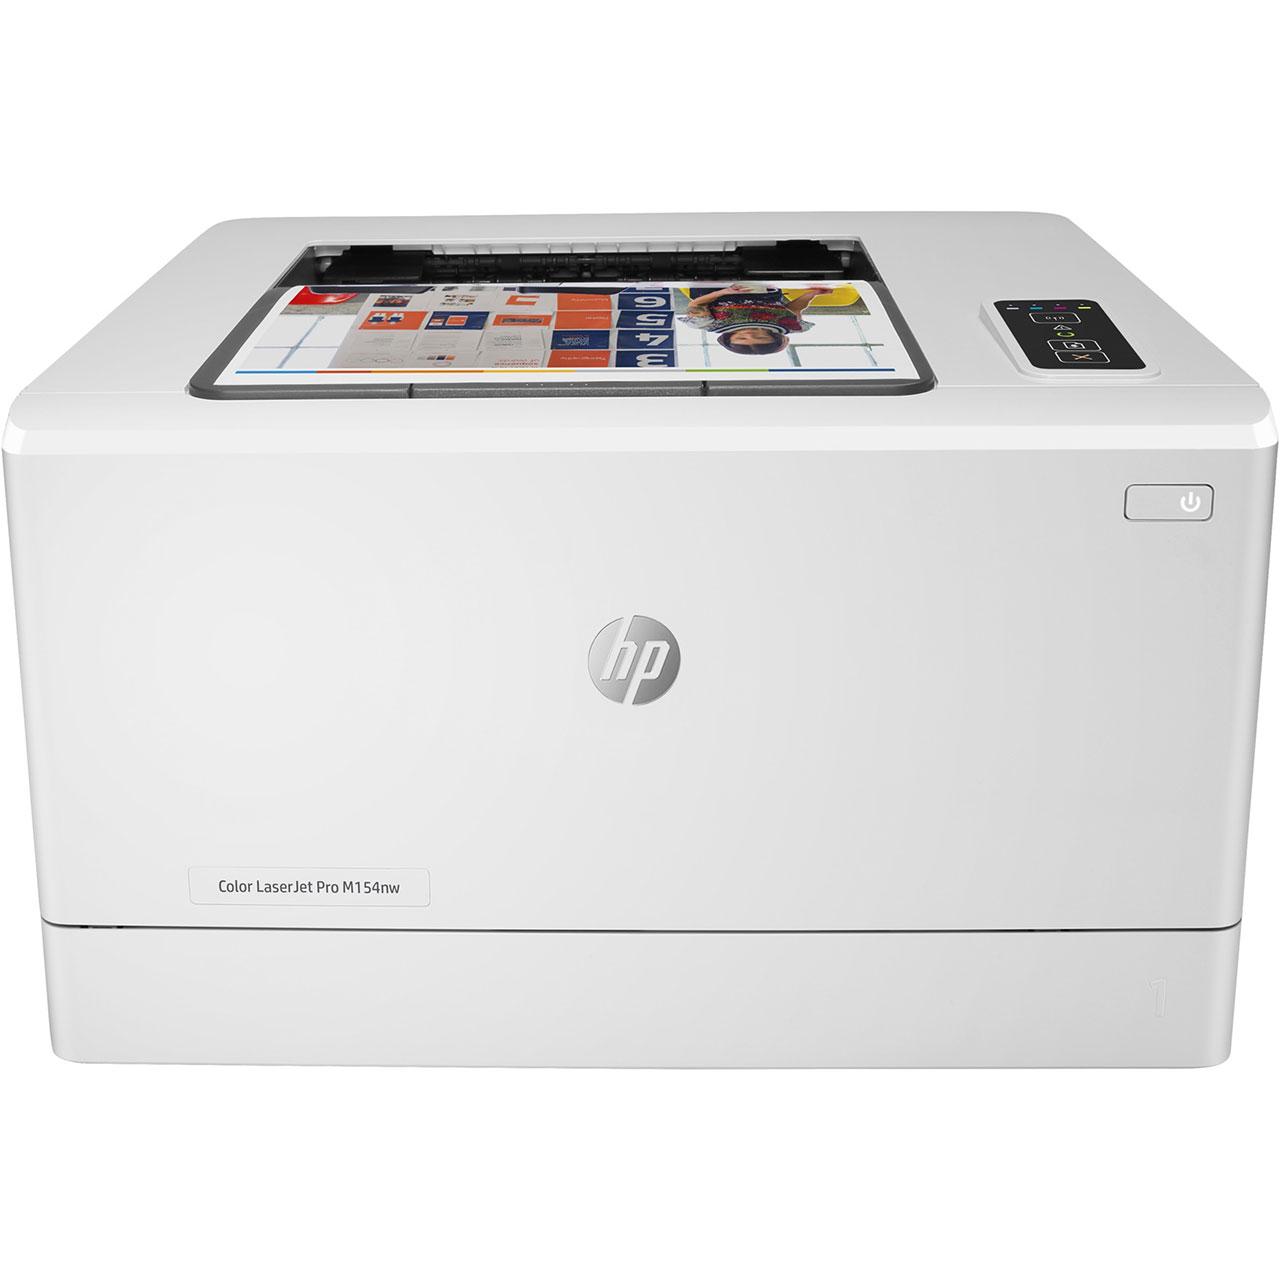 HP Color LaserJet Pro M154nw toner